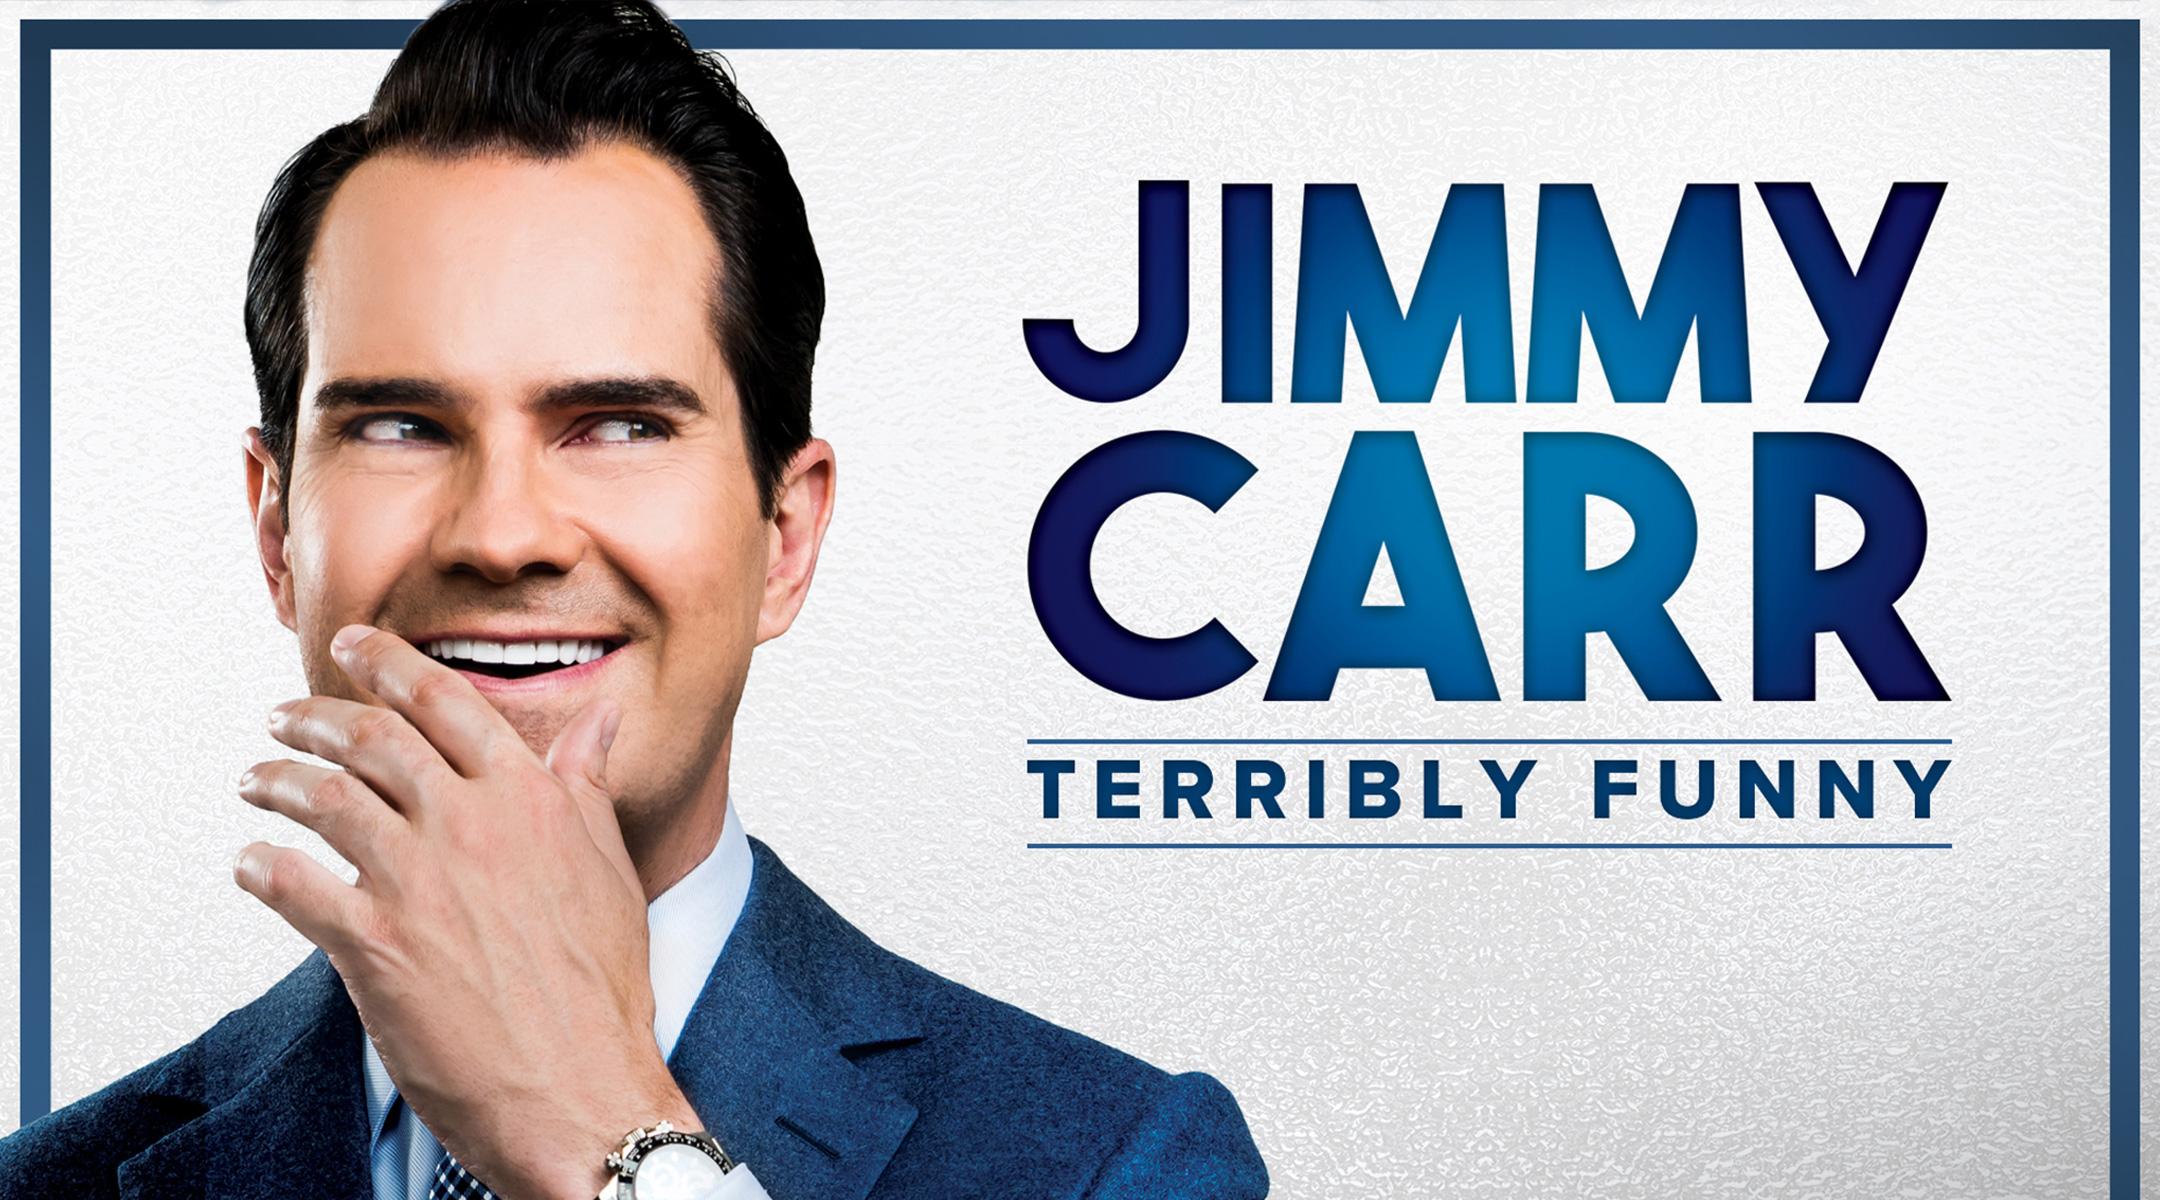 Jimmy Carr: Terribly Funny - Reading